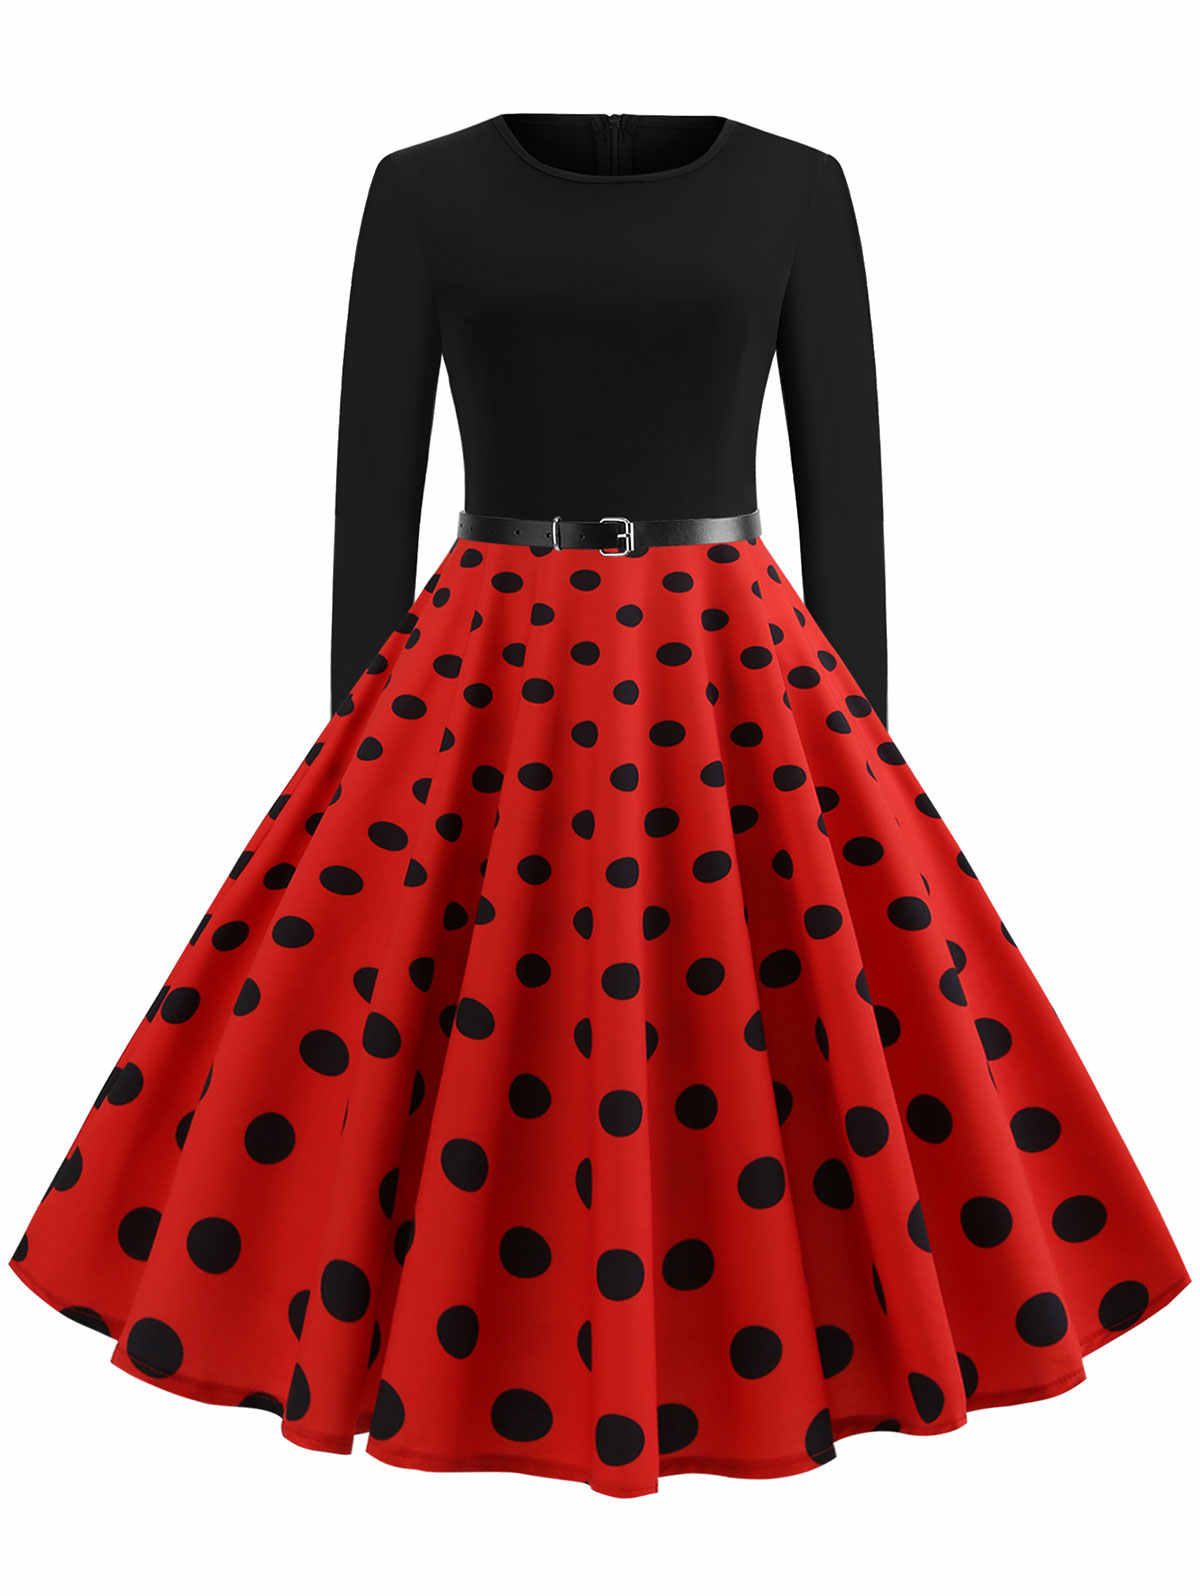 1a4e2bbf20 Detail Feedback Questions about ZAN.STYLE Vintage Dress Women Summer ...